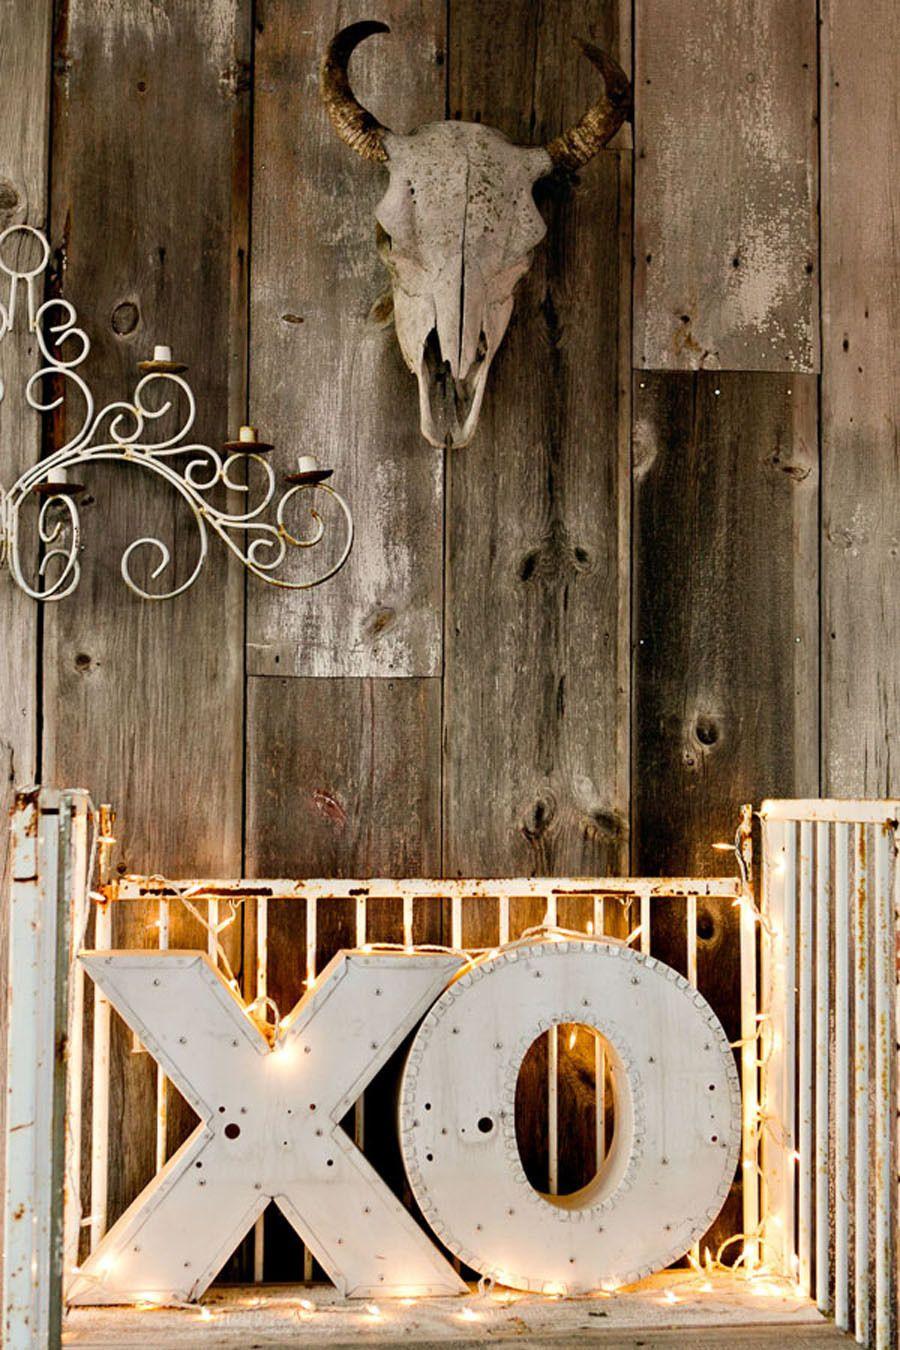 Texas Wedding - Rustic Decor Photography: Katherine OBrien Photography - katherineobrien.com